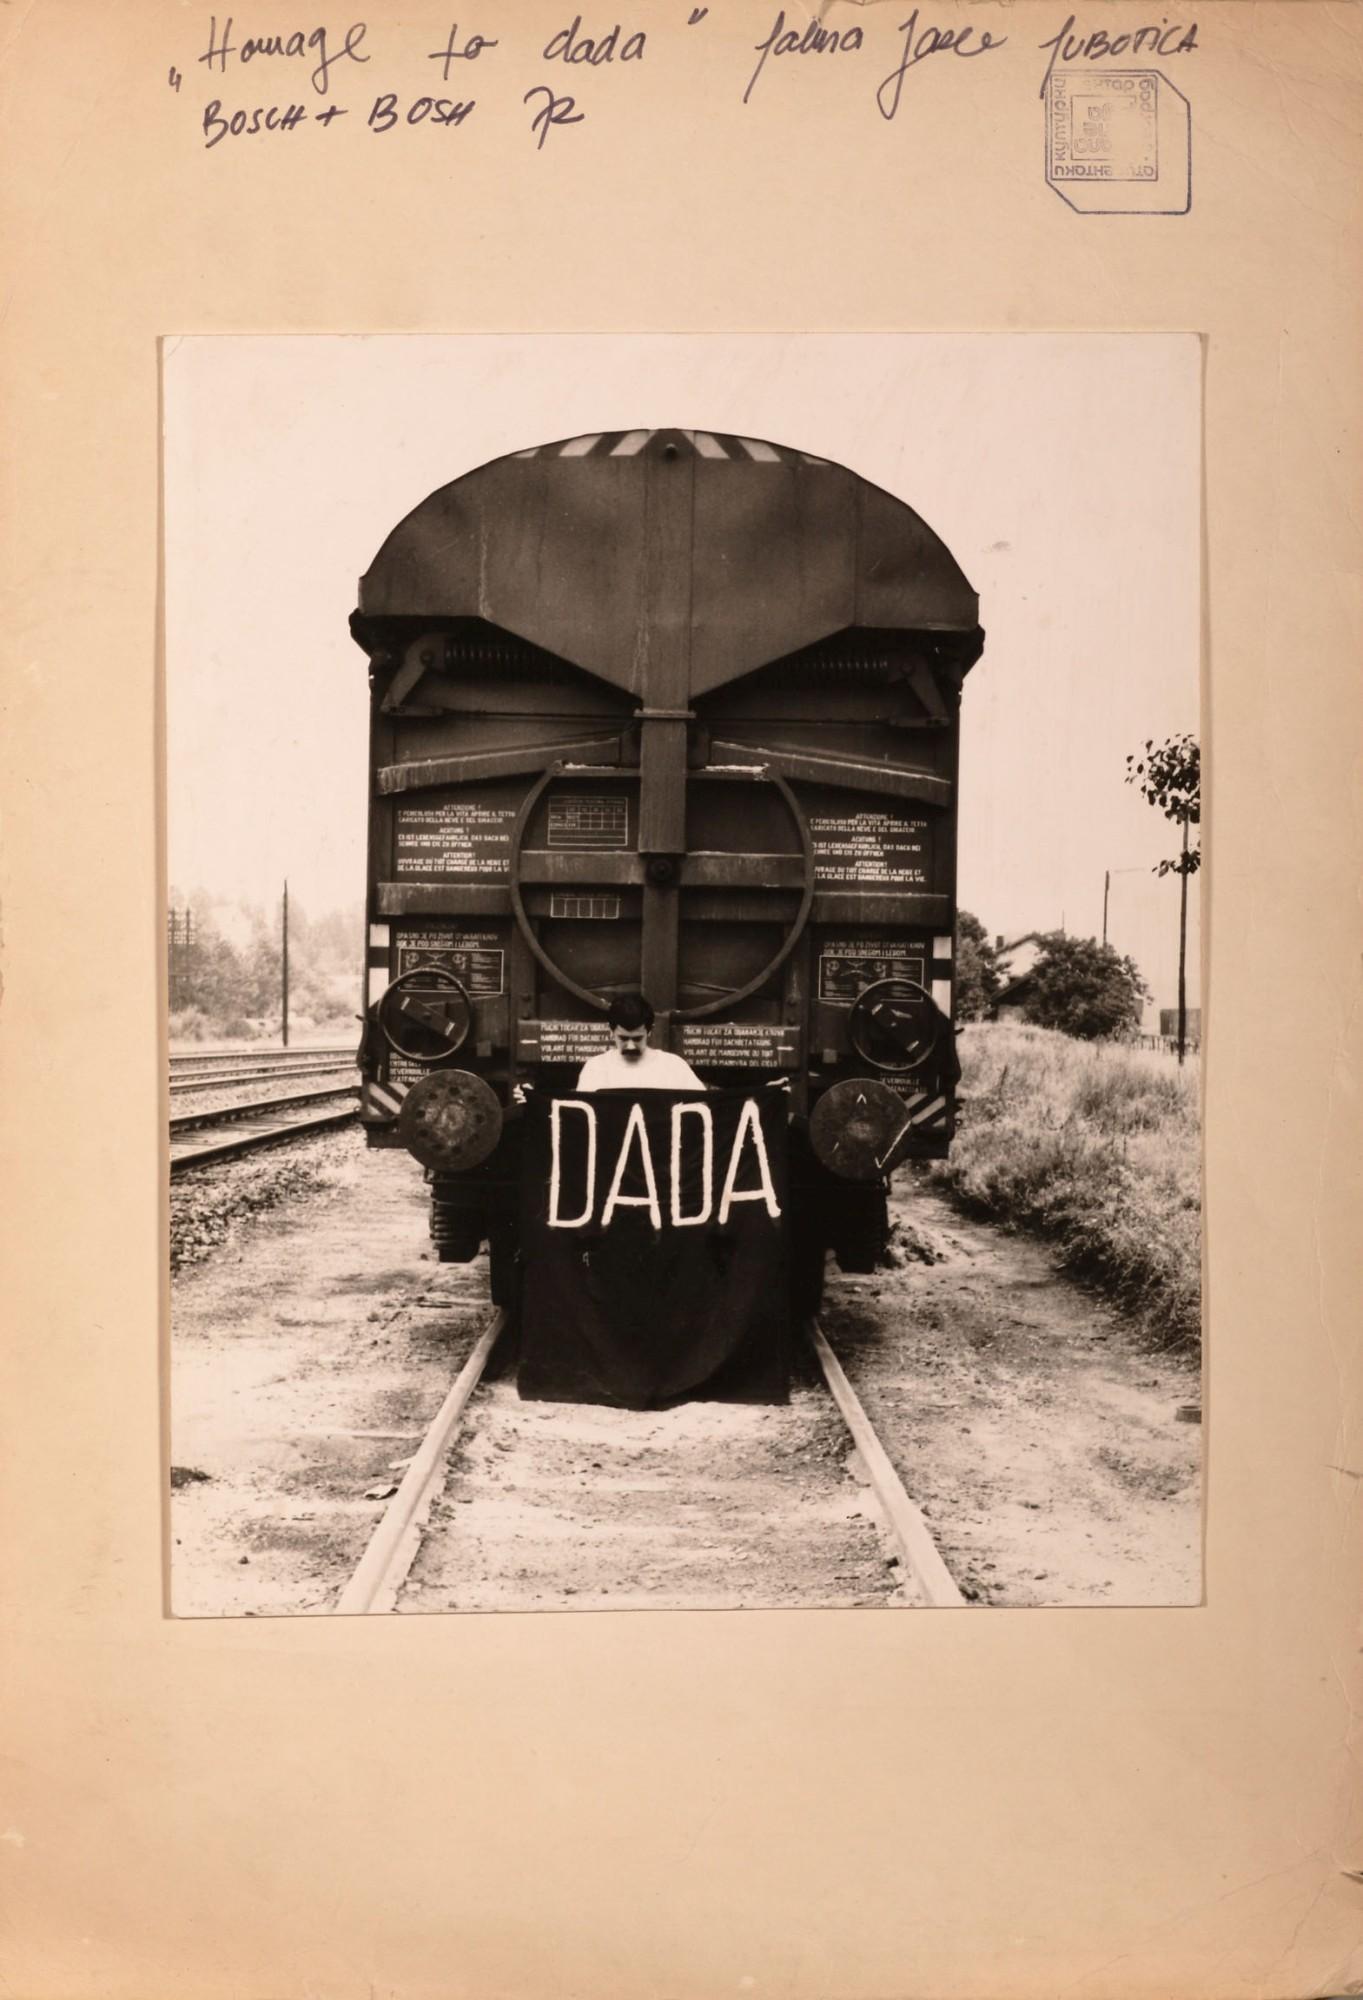 László Szalma (BOSCH+BOSCH), Hommage to Dada, 1972, collage, 470 x 323 mm.